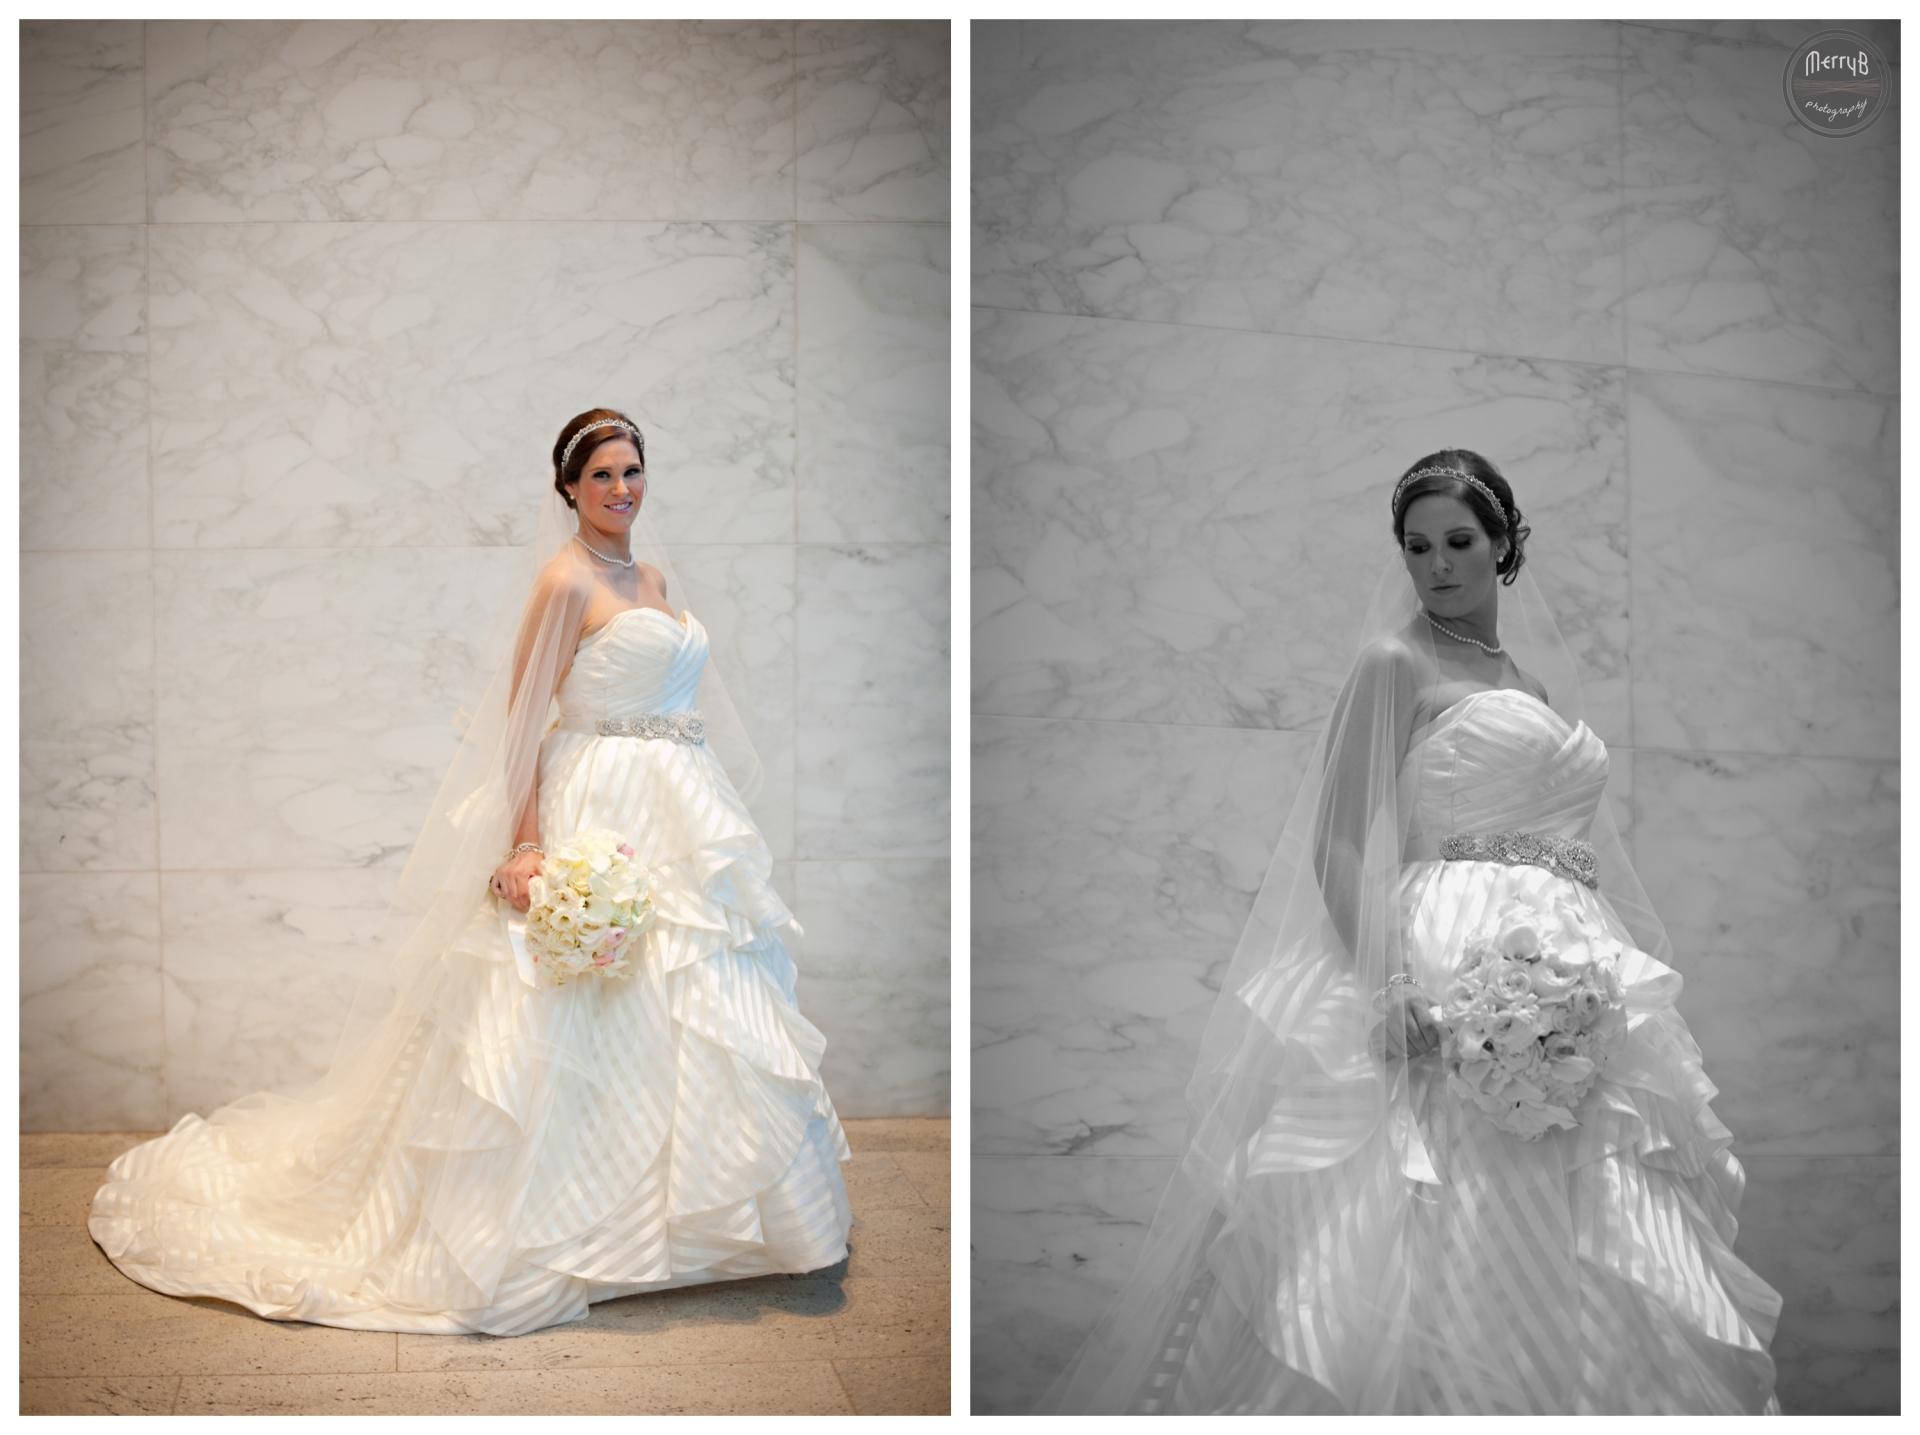 mal+jesse wedding0033